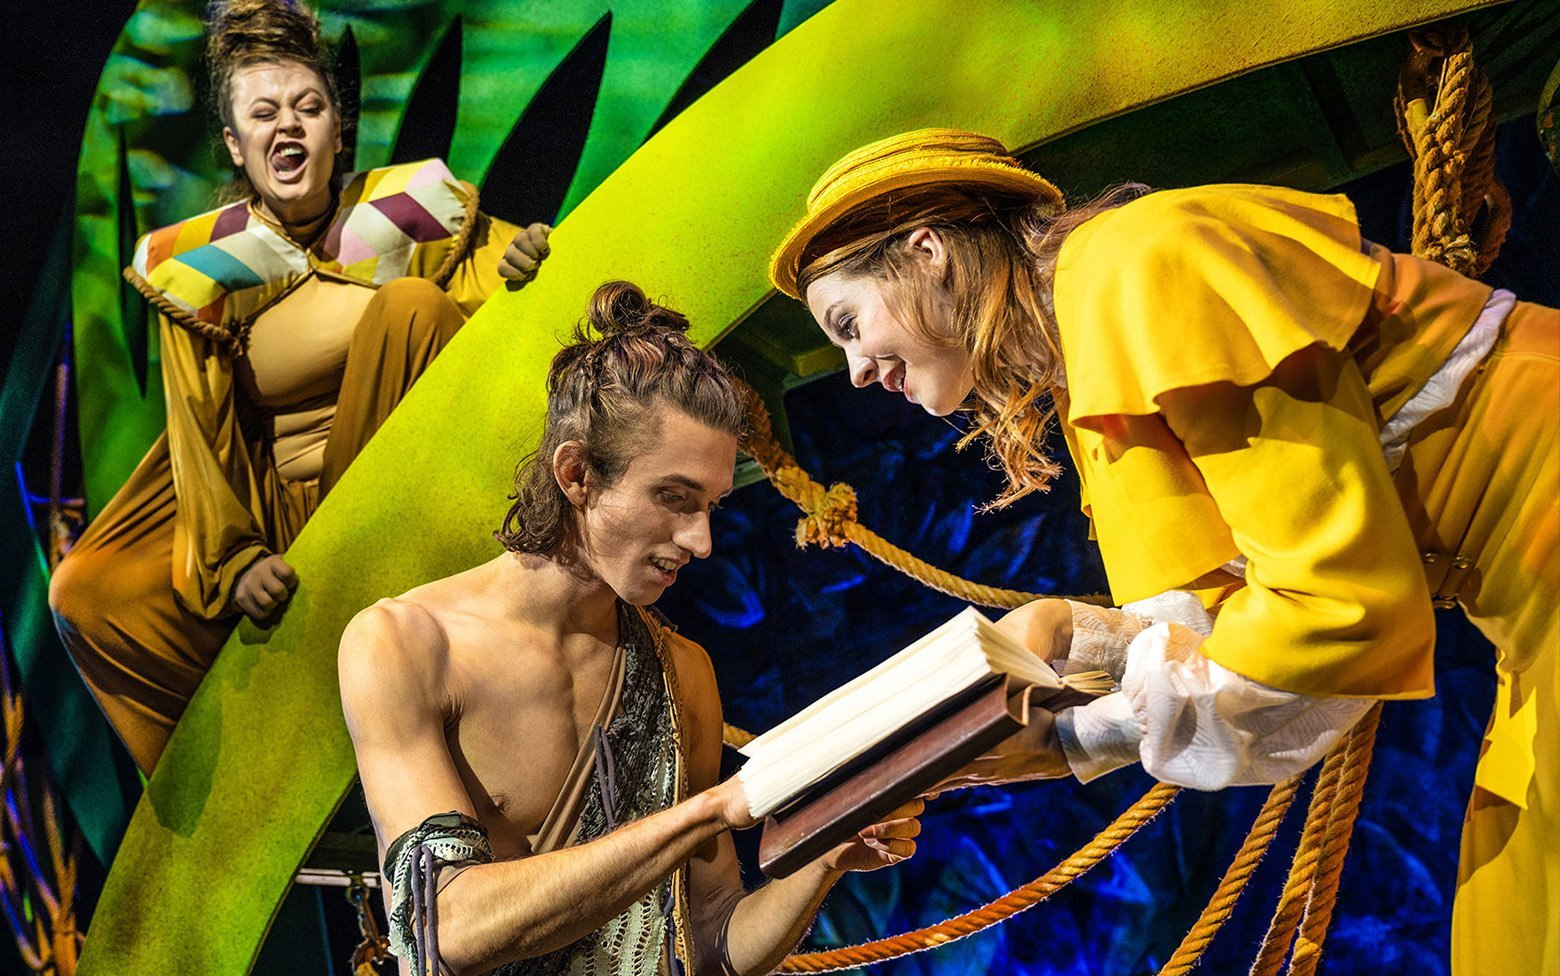 Tarzan_-_das_Musical_Theater_Liberi_Galerie-6_1560x976px.jpg